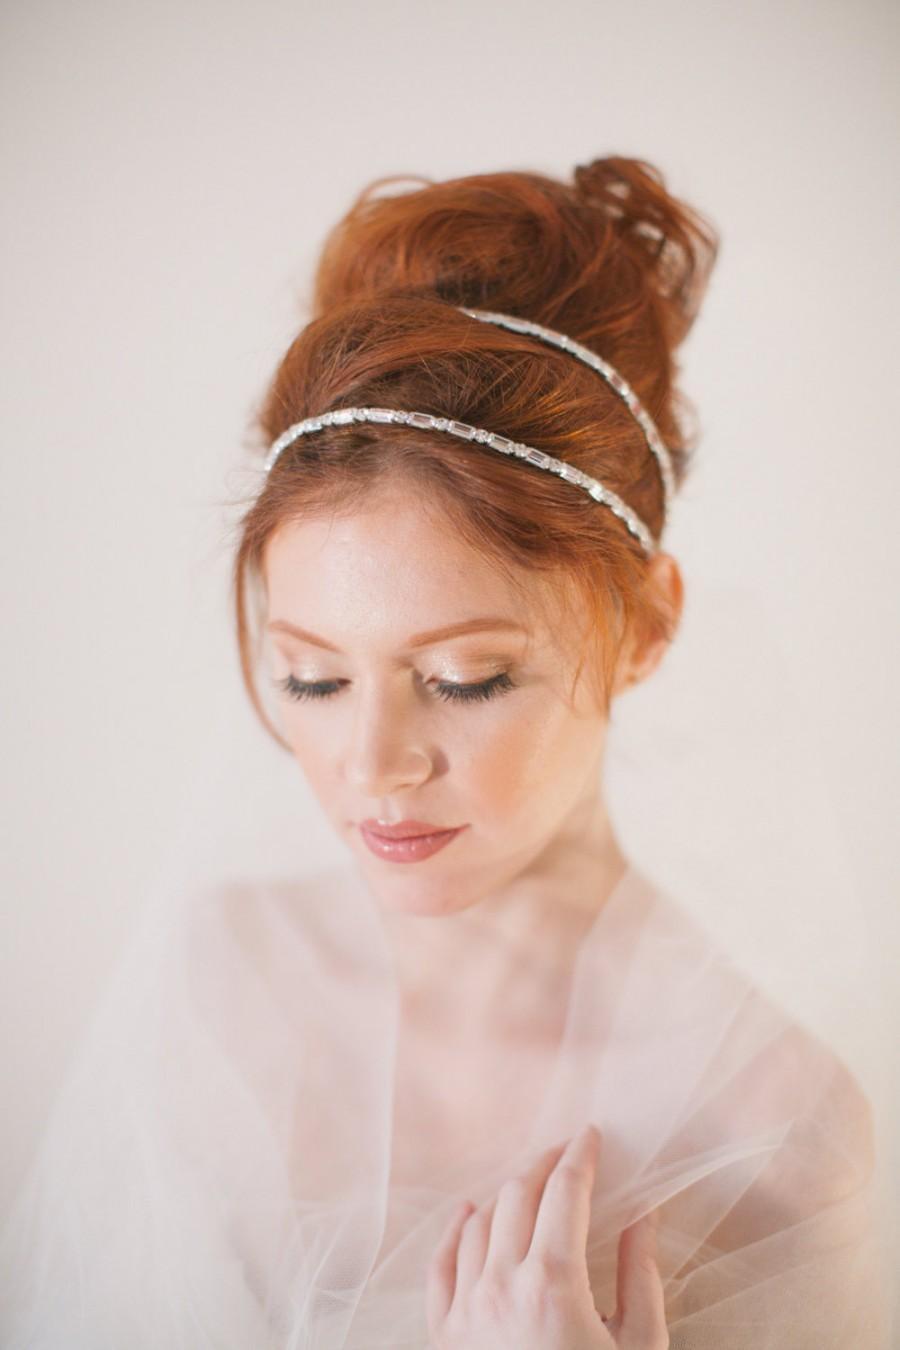 زفاف - Double strand headband, VOLE MON AMOUR wedding, rhinestones, headband, bridal, wedding, bride, hair accessory, bridesmaid, hair bun